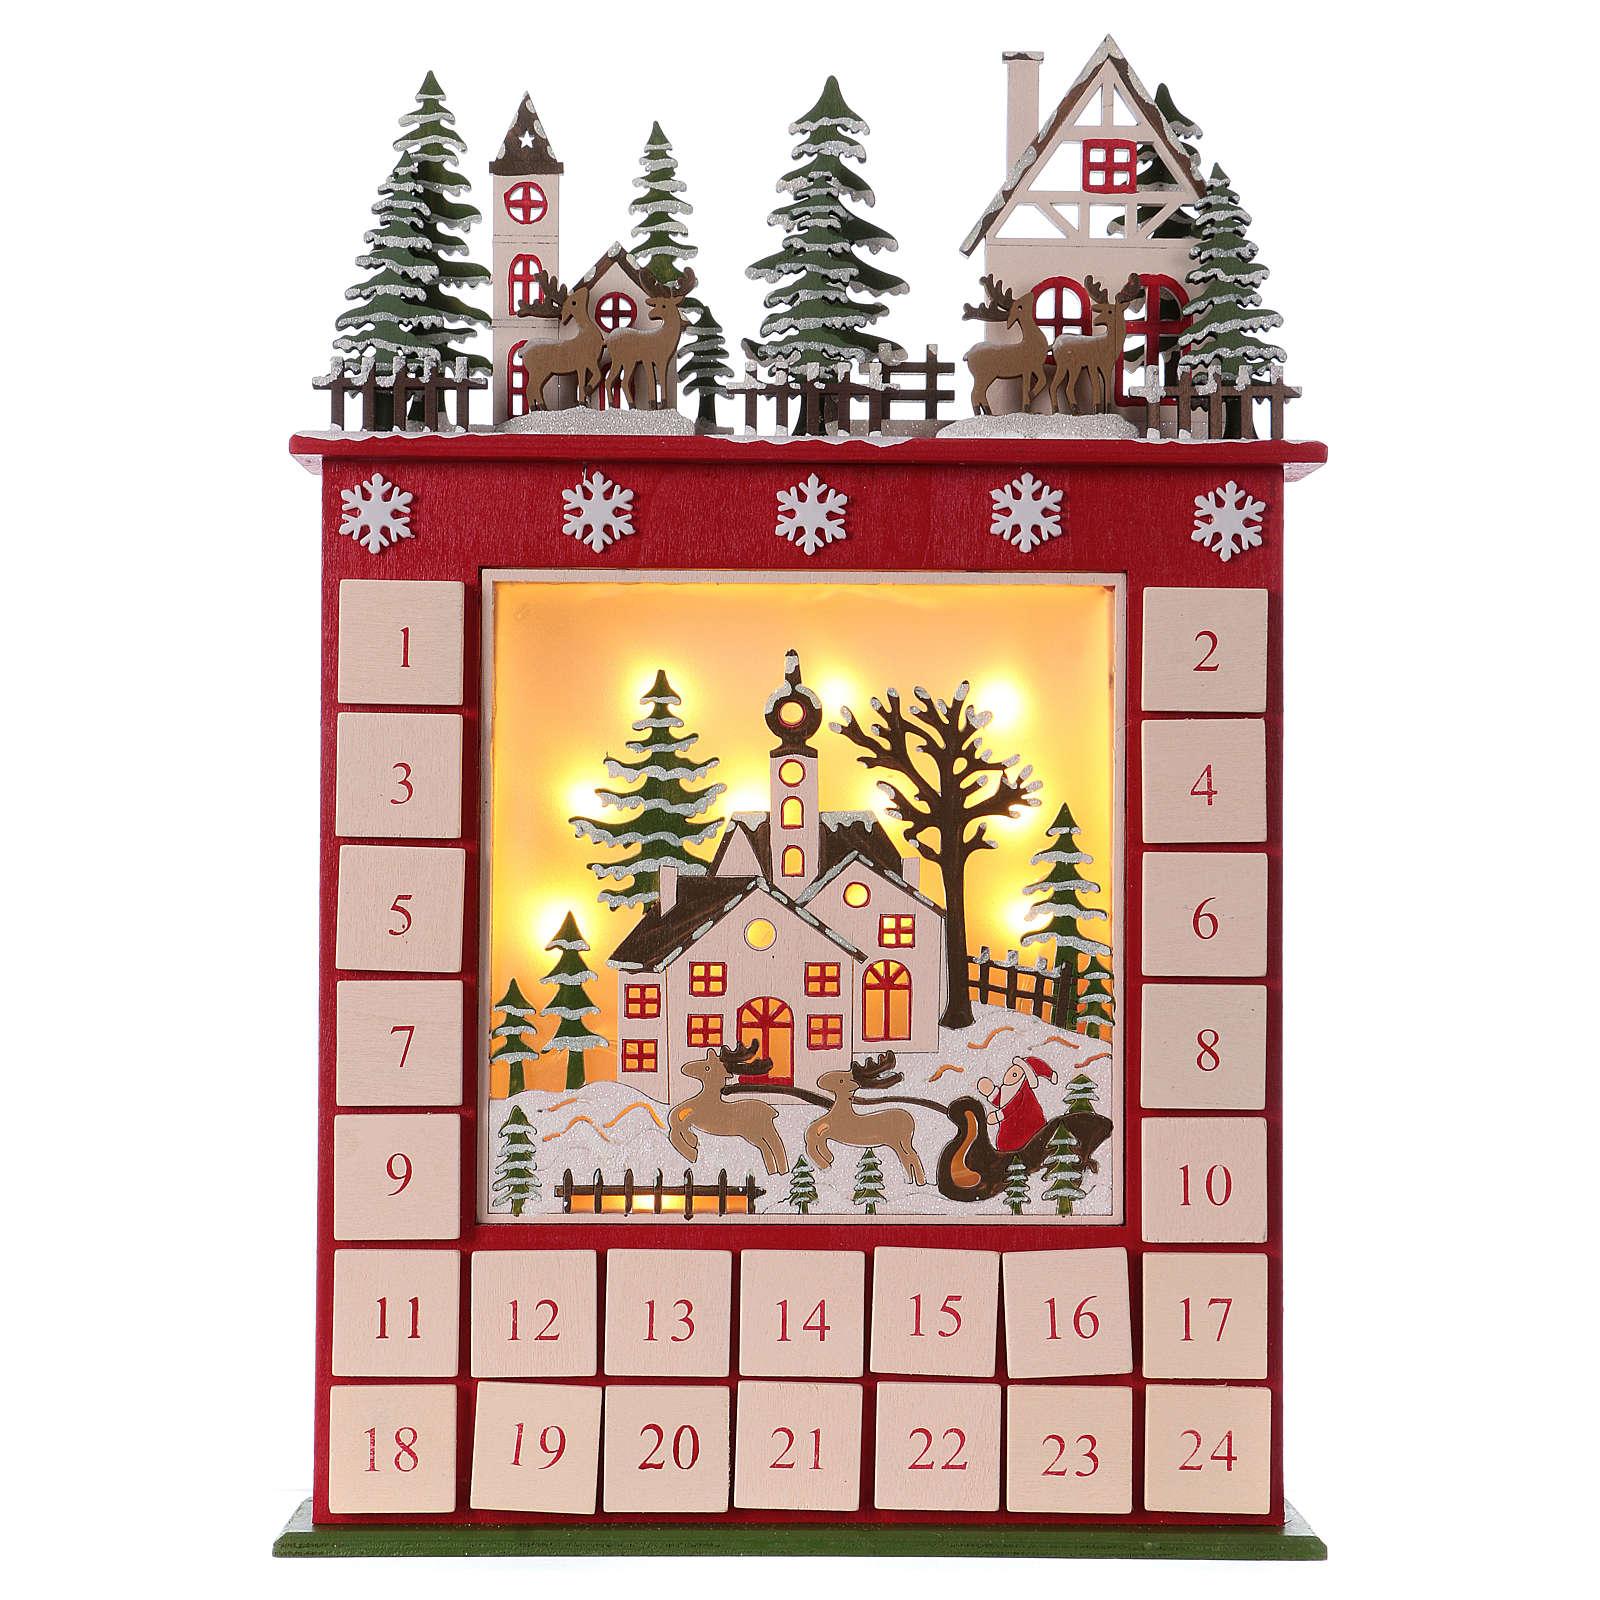 Adviento Calendario.Calendario De Adviento 45 Cm De Madera Paisaje Y Led